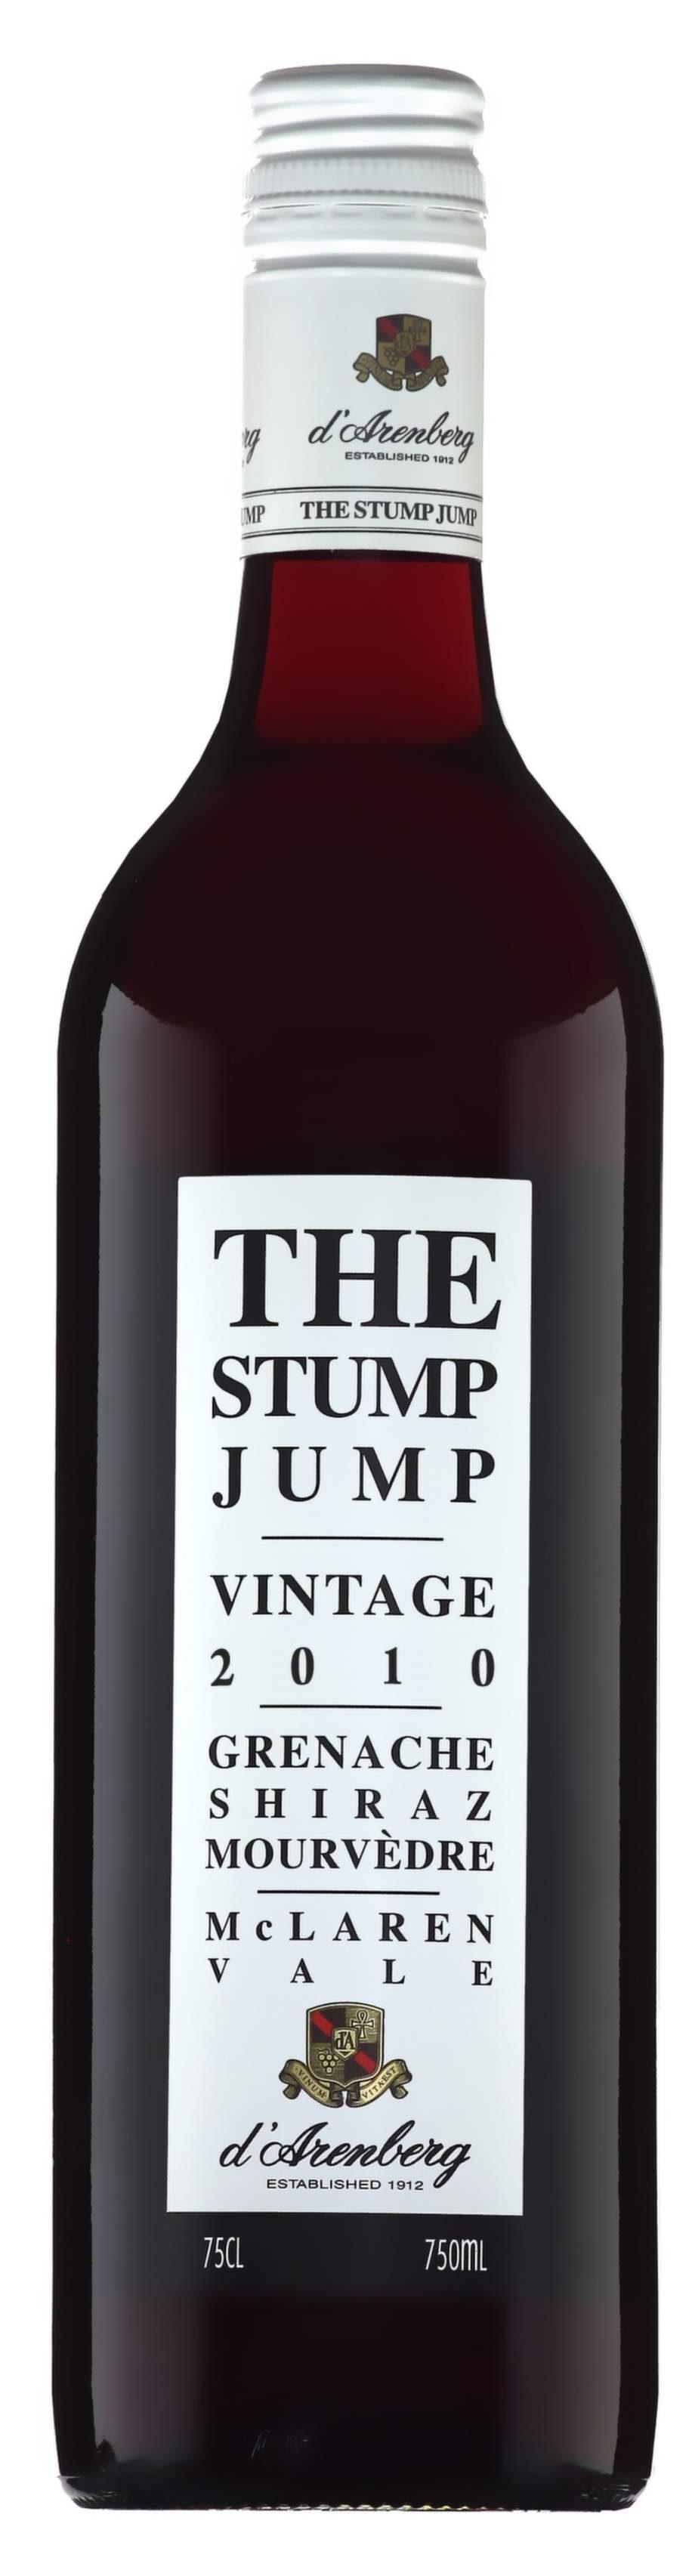 The Stump Jump Reserve Grenache 2011 (6347) Australien, 99 kronor